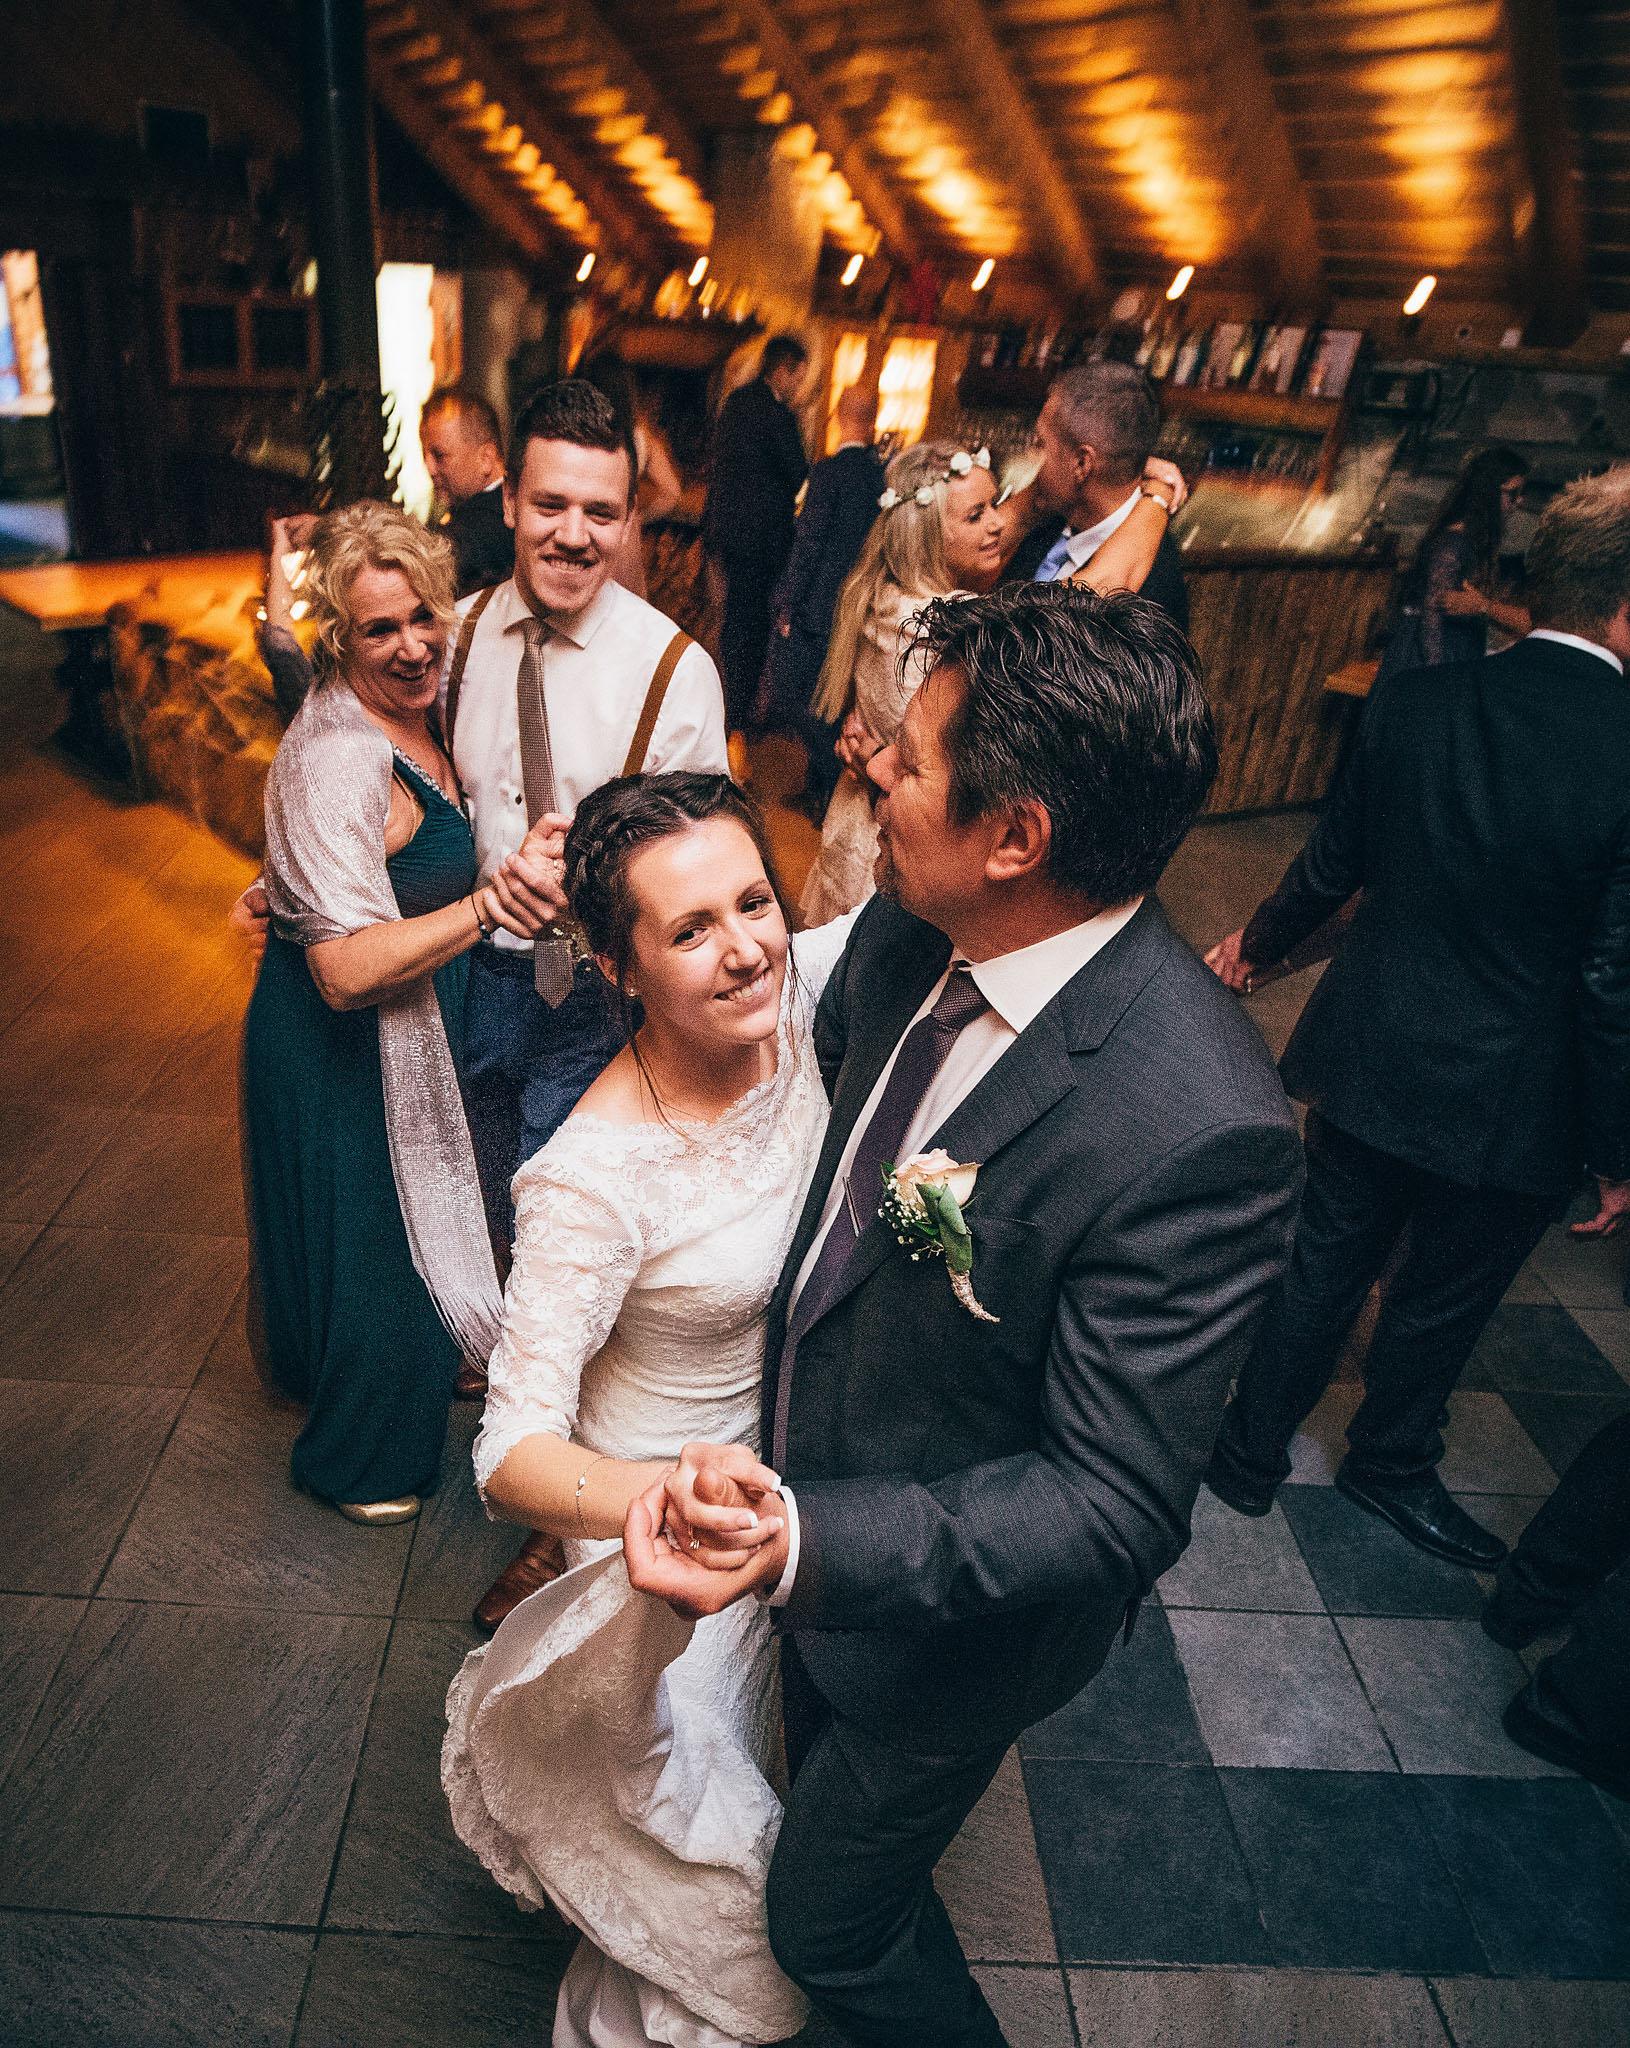 Norway+wedding+photographer+elopement+pre+wedding+Casey+Arneson-130.jpg